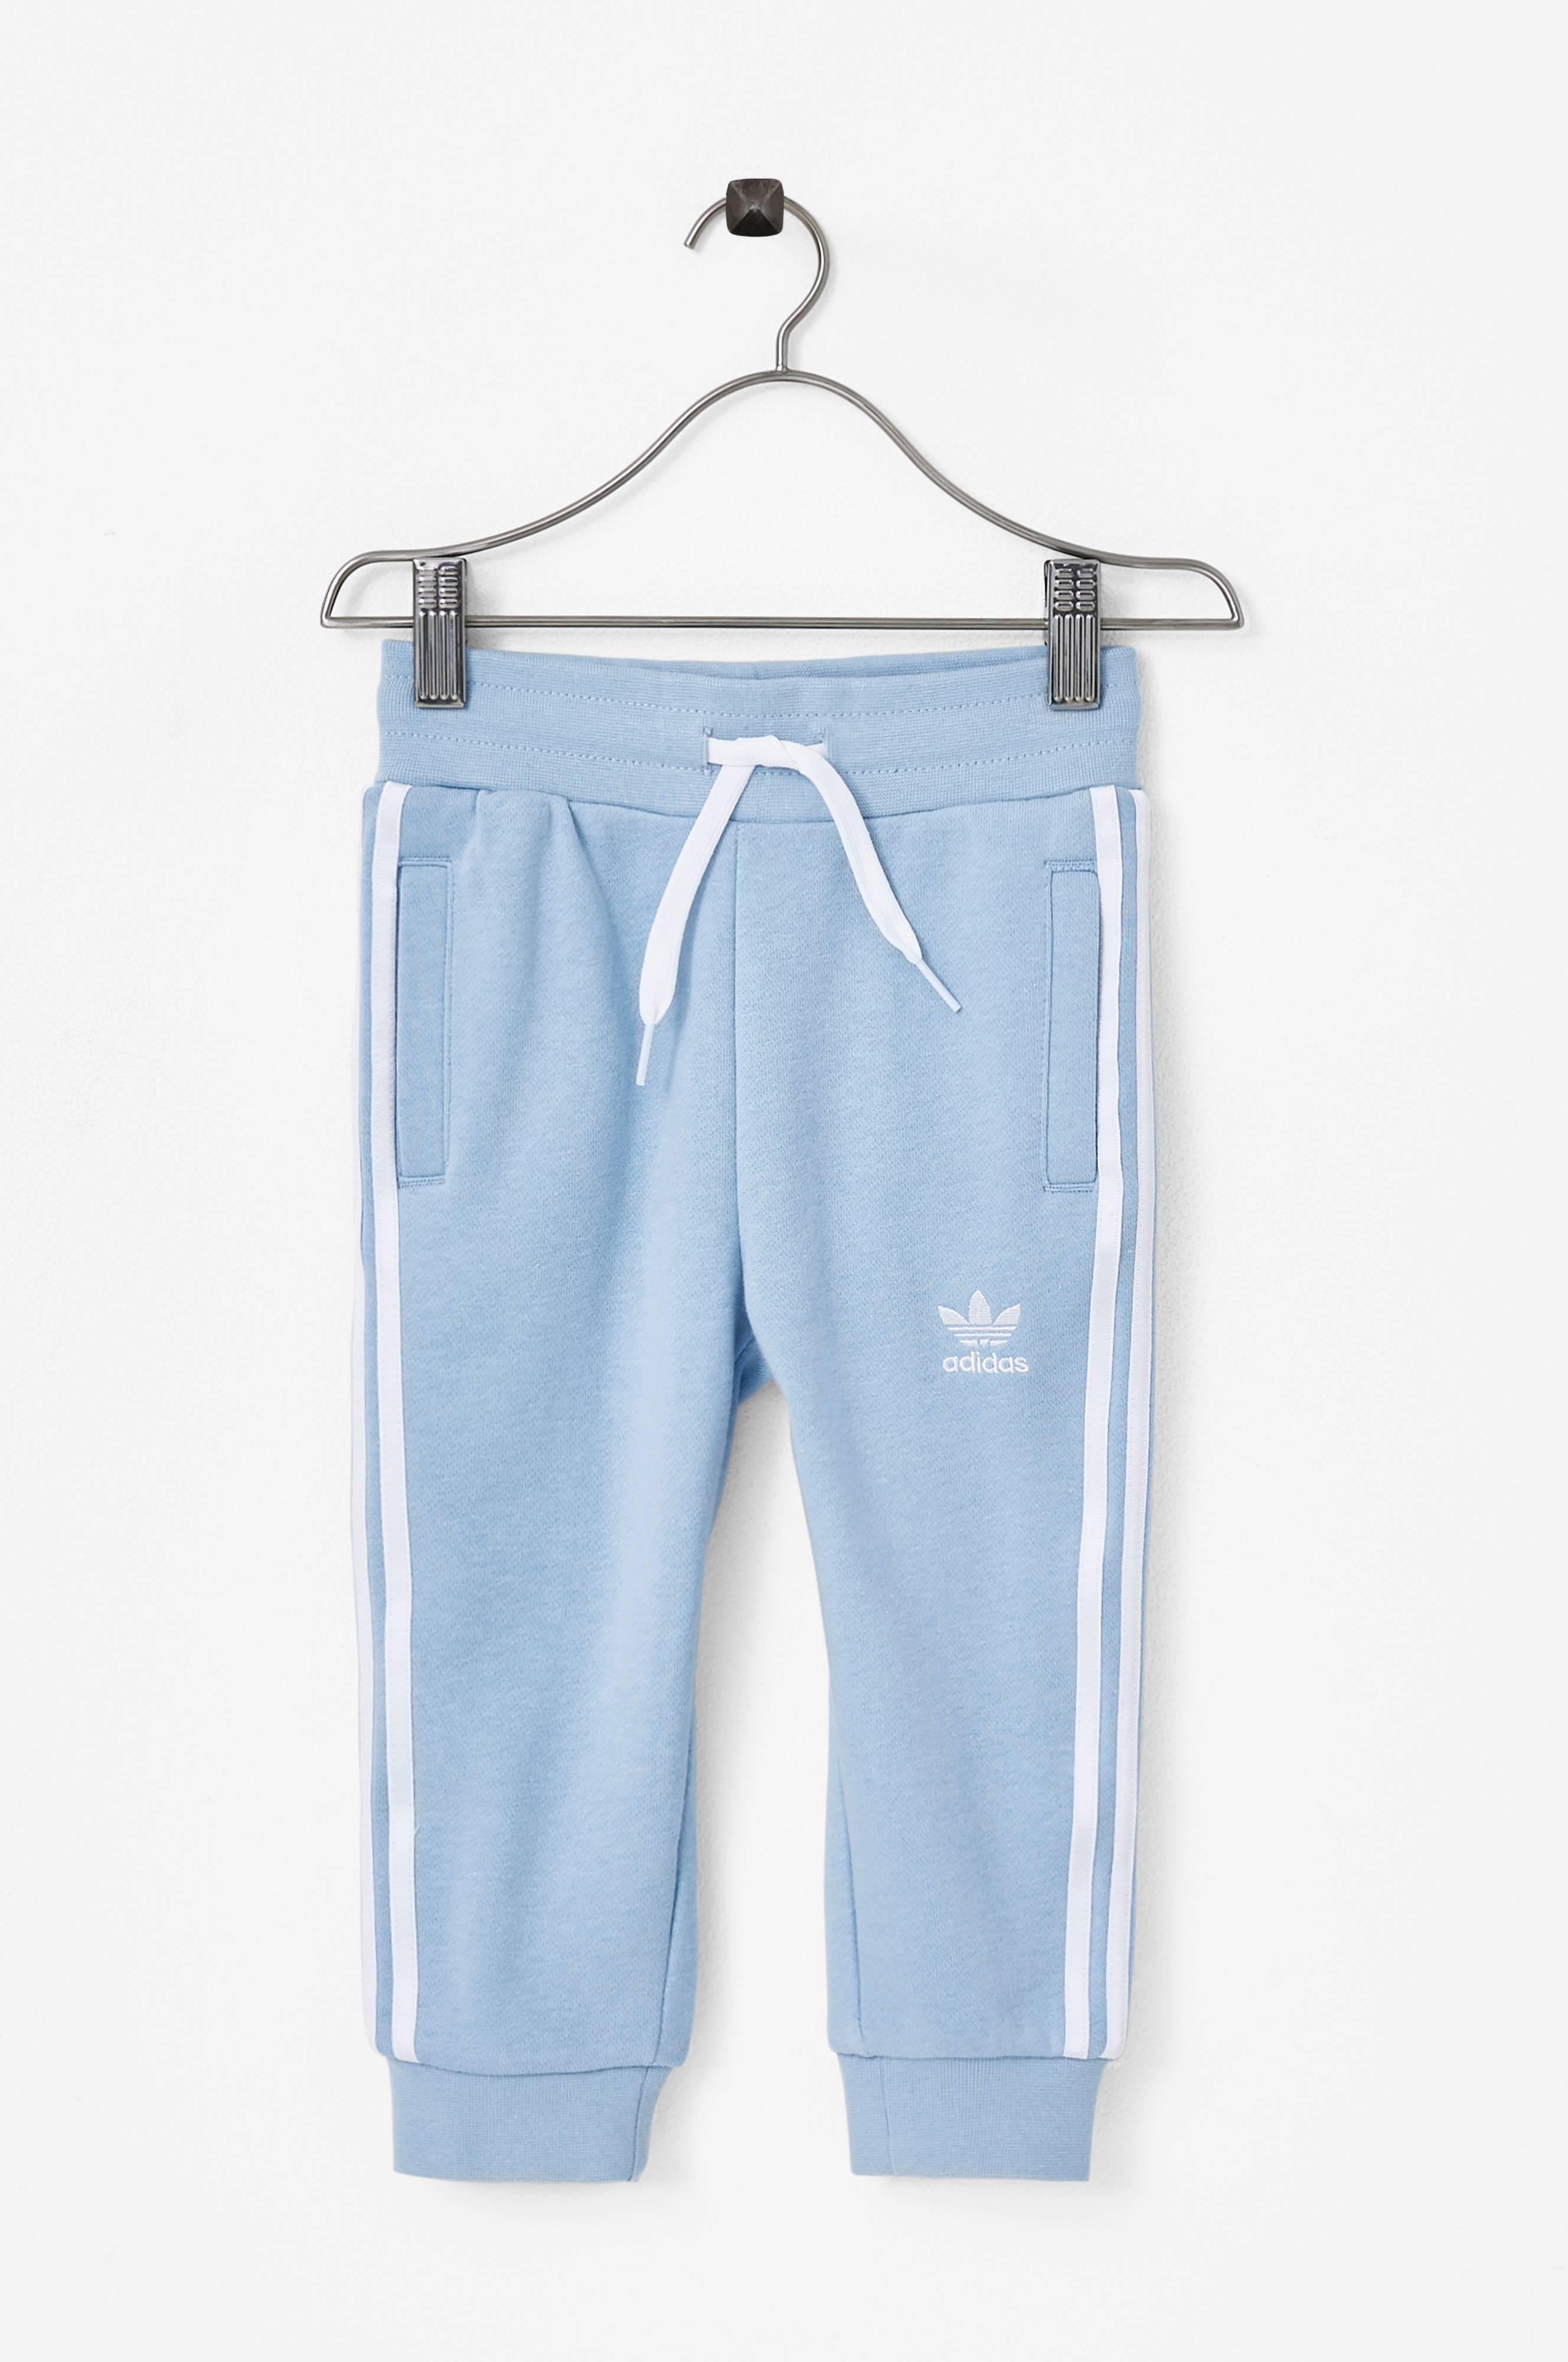 adidas Originals Babyset Culture Clash Crewneck Sweatshirt